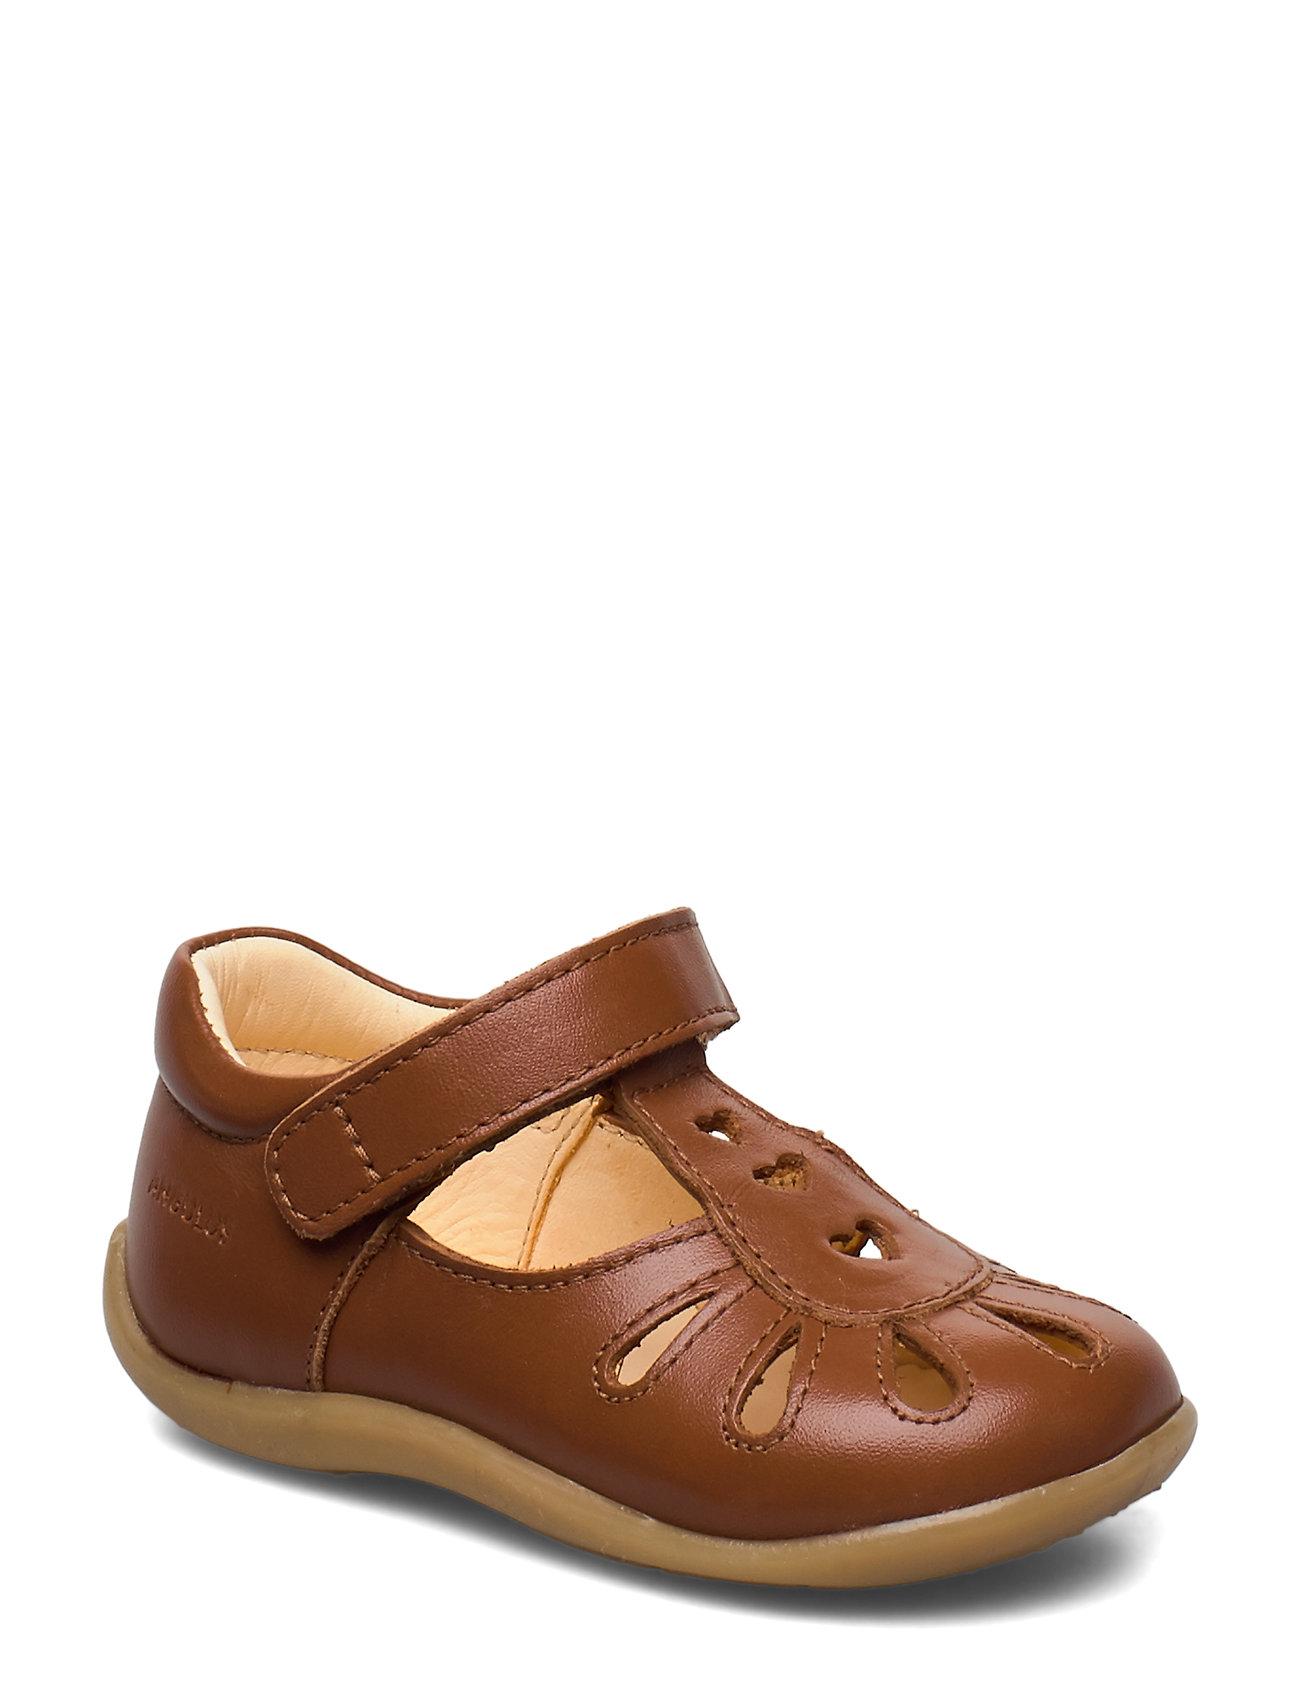 ANGULUS - Sandals - flat - closed toe -  - lauflernschuhe - 1431 cognac - 0